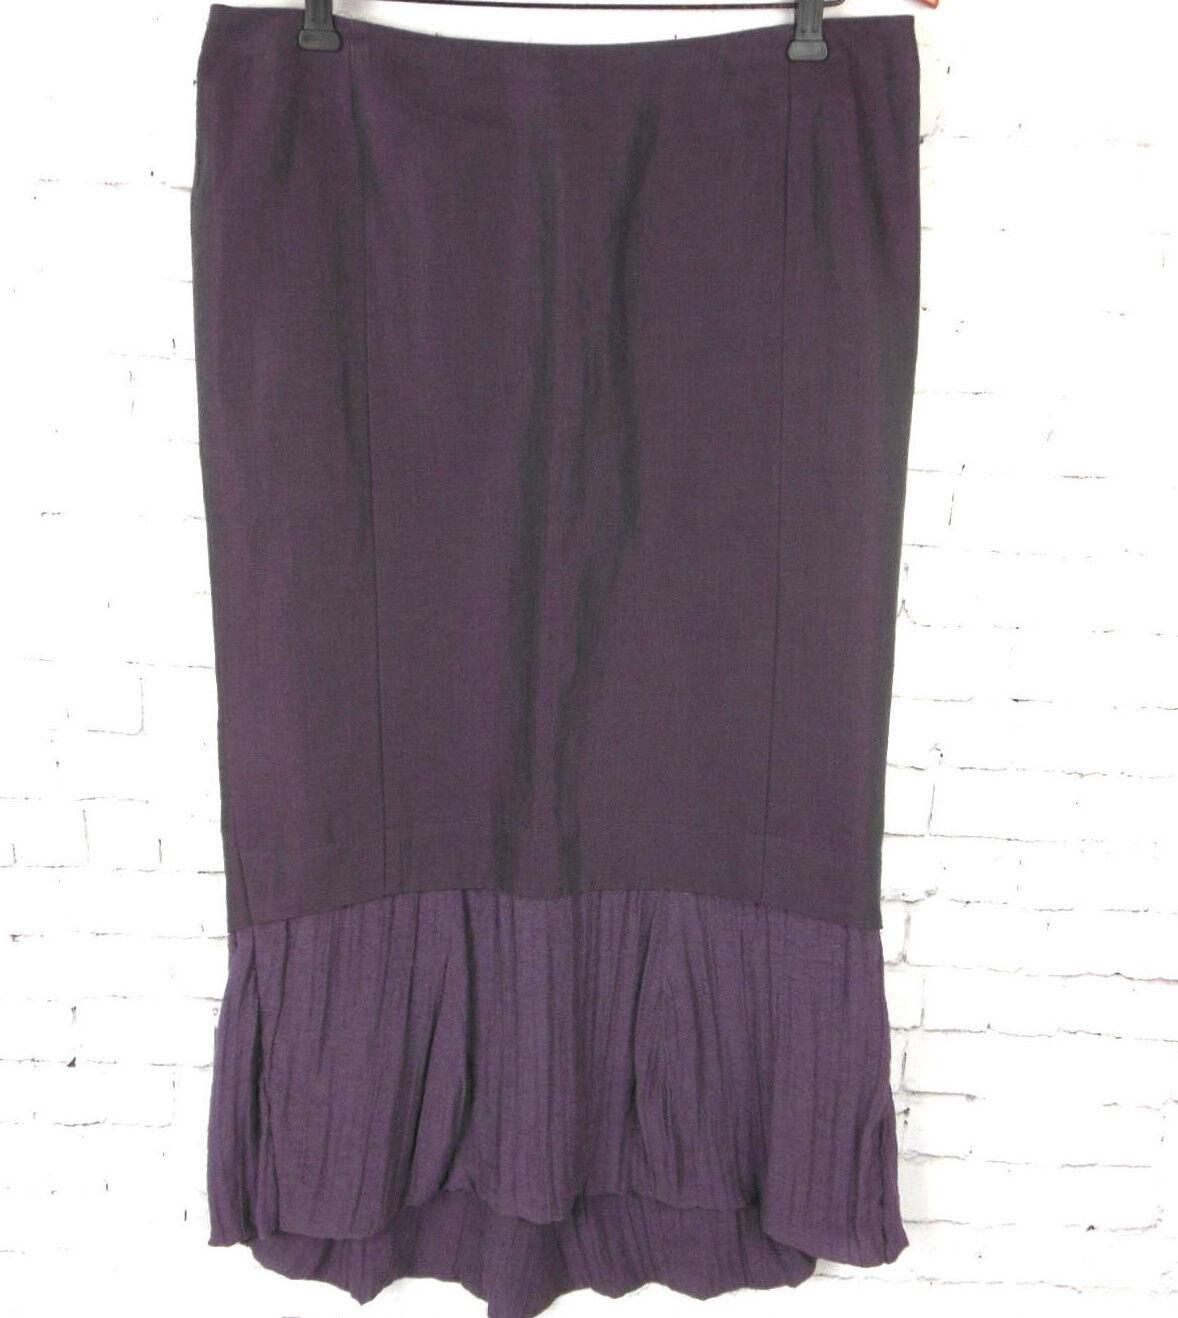 ..SONJA MAROHN Women's Linen Purple Lagenlook Skirt Sz 8 - 10